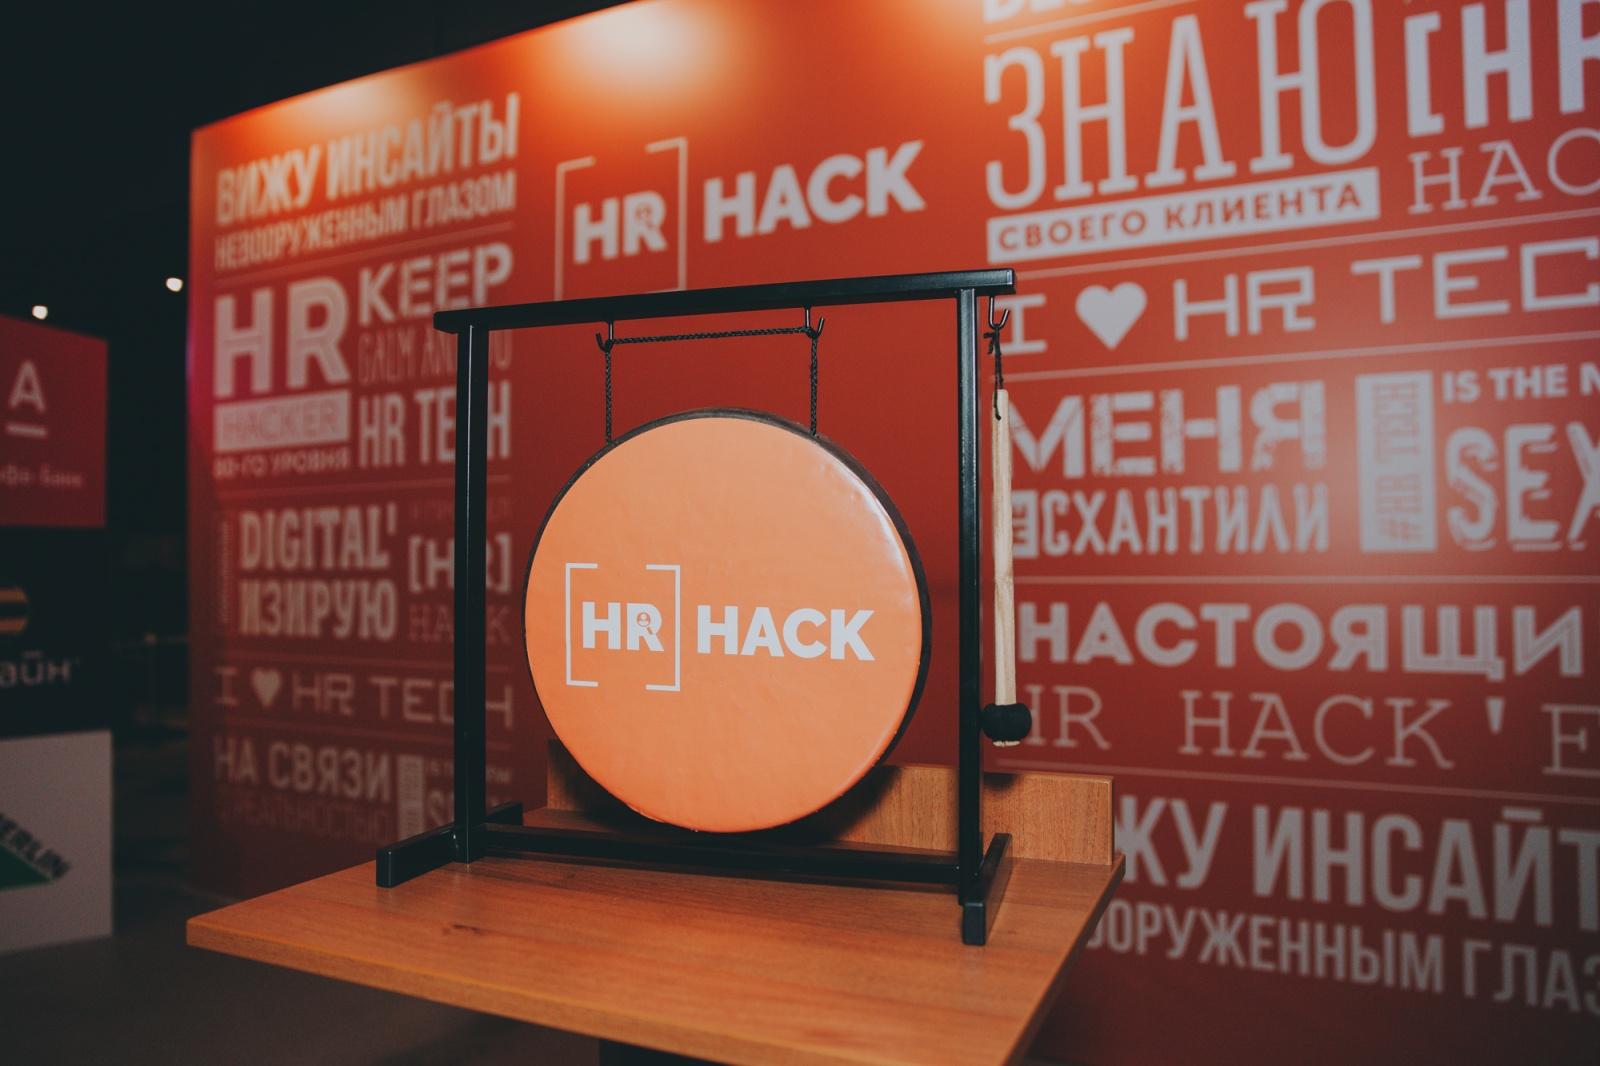 Итоги хакатона HR-hack - 4